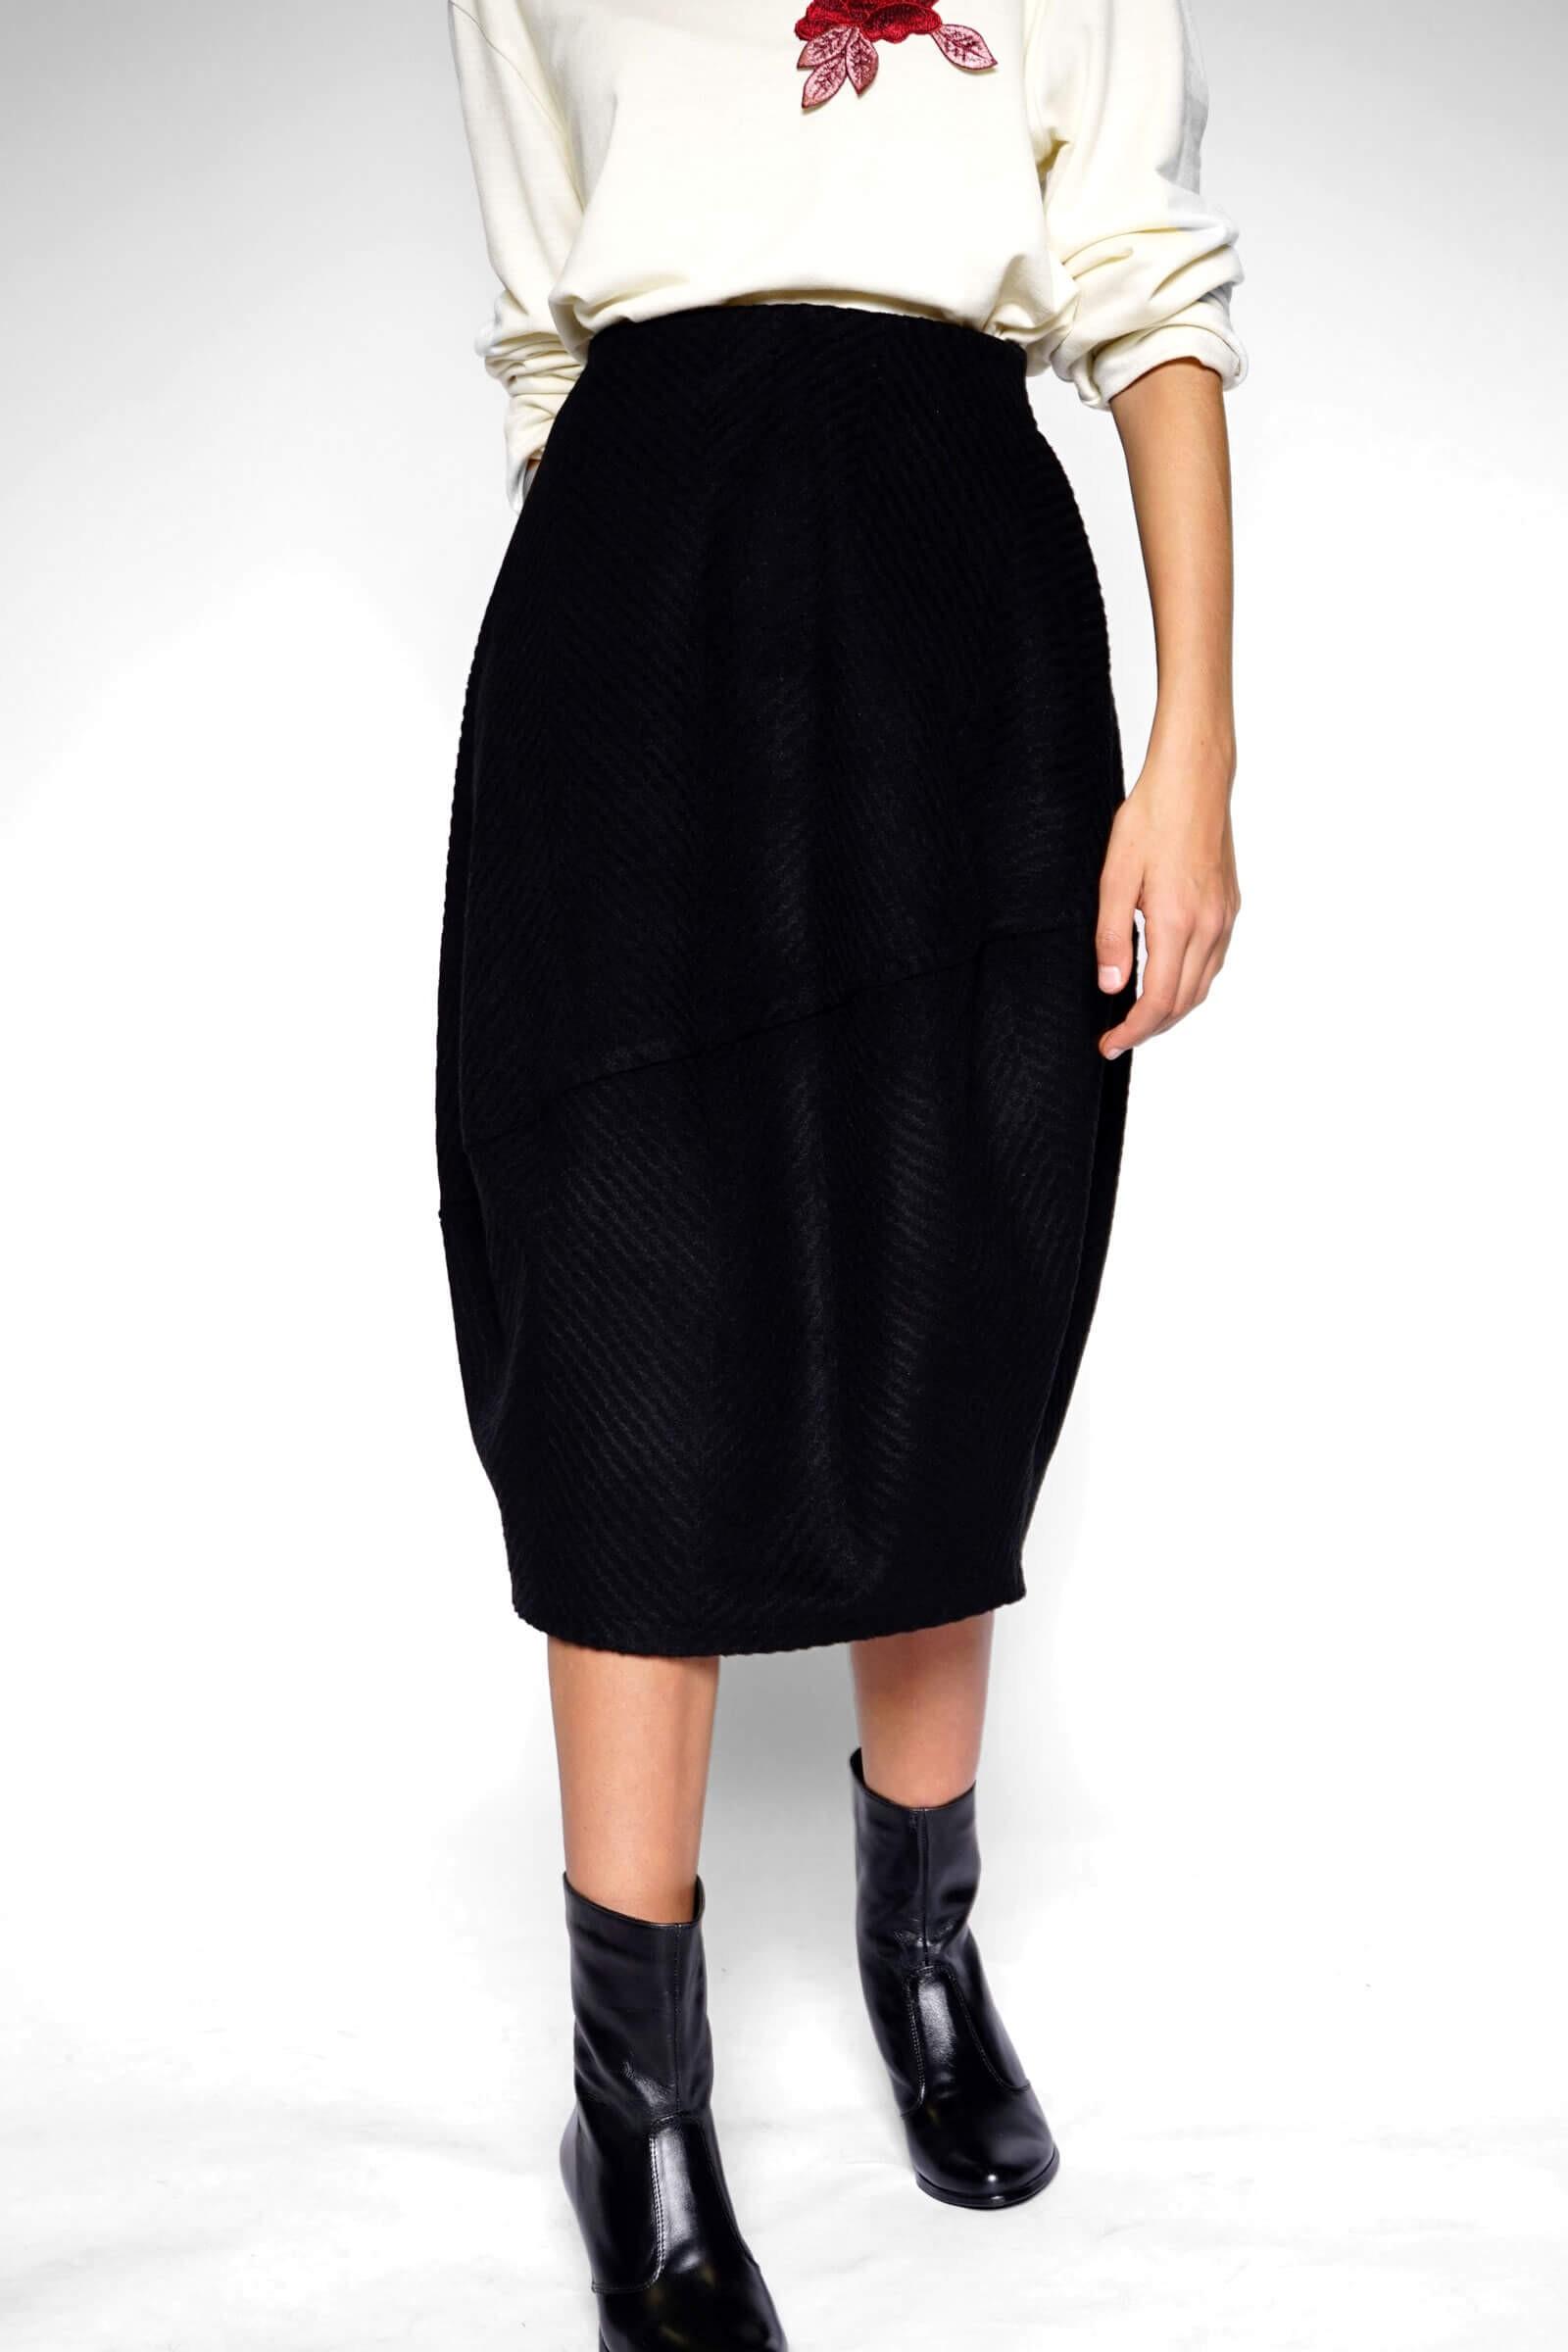 Medium black tulip skirt